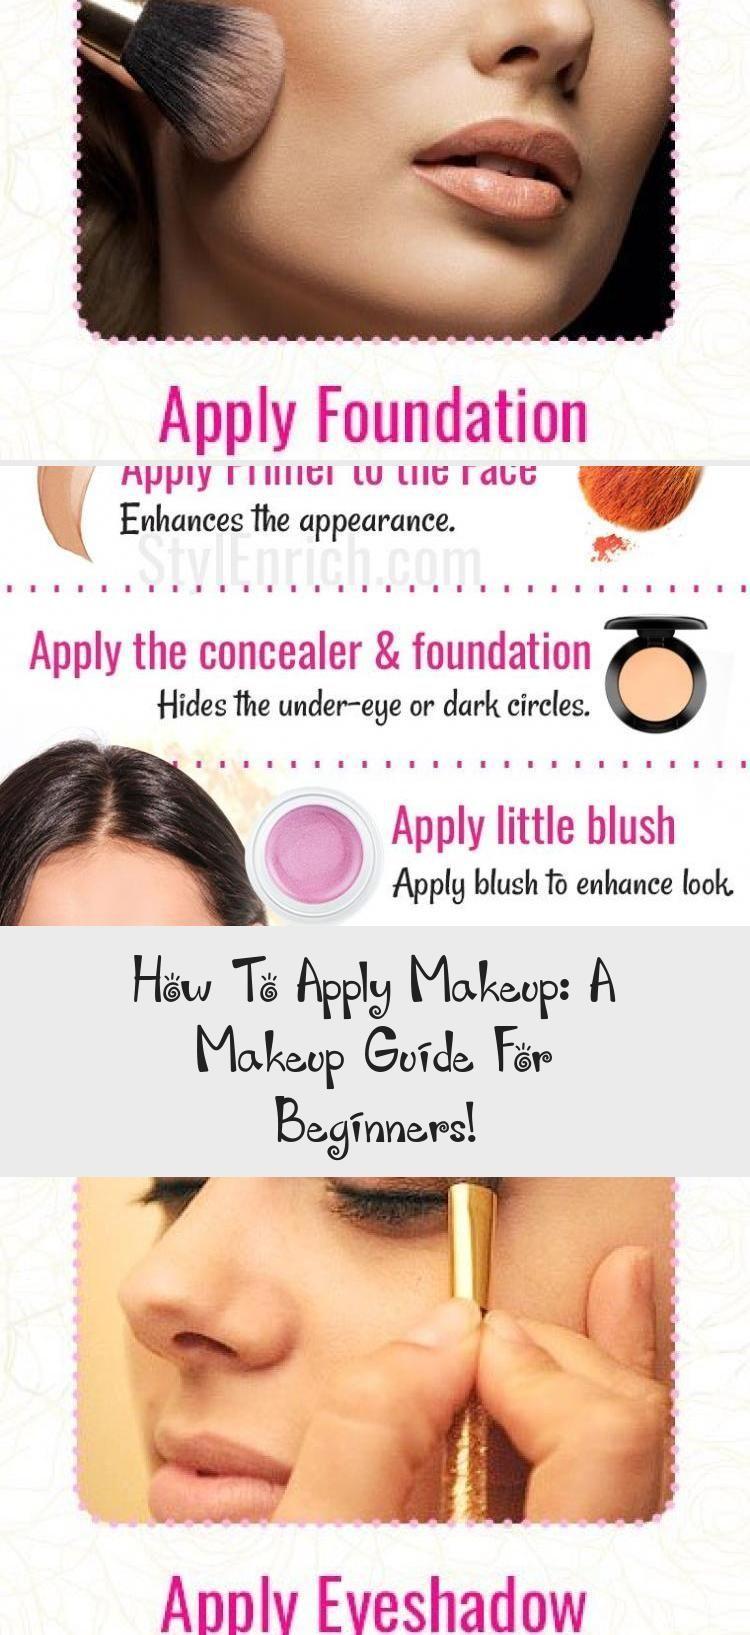 How To Apply Makeup A Makeup Guide For Beginners Beauty Apply Beauty Beginners Guide Makeup Apply Makeup For Beginners Makeup Guide How To Apply Makeup